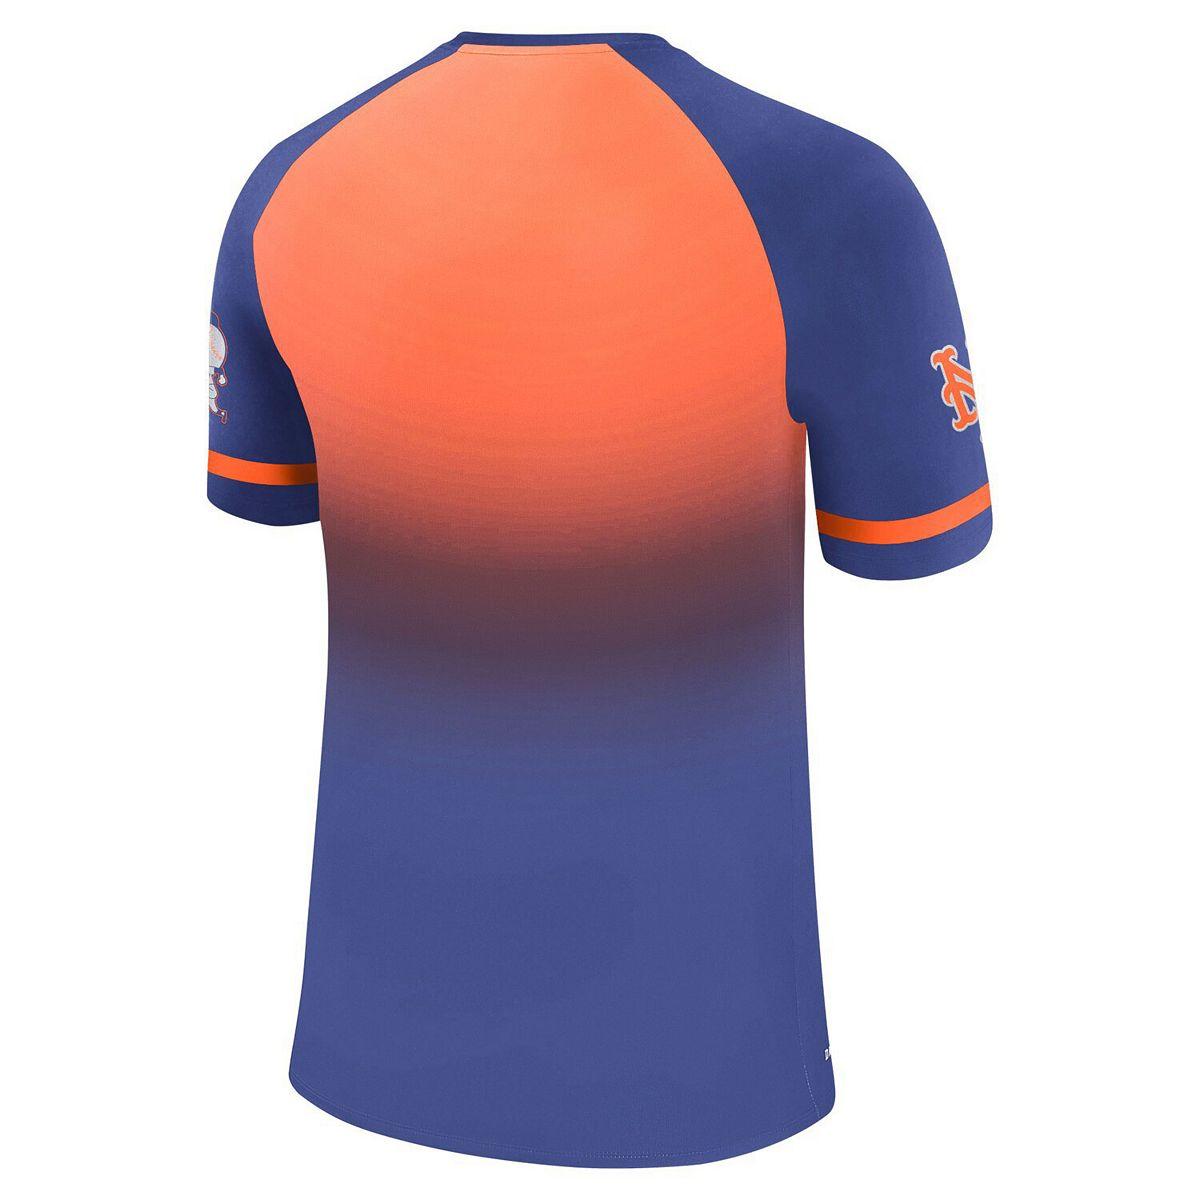 Men's Nike Royal New York Mets Legend Raglan T-Shirt 0Ldi1